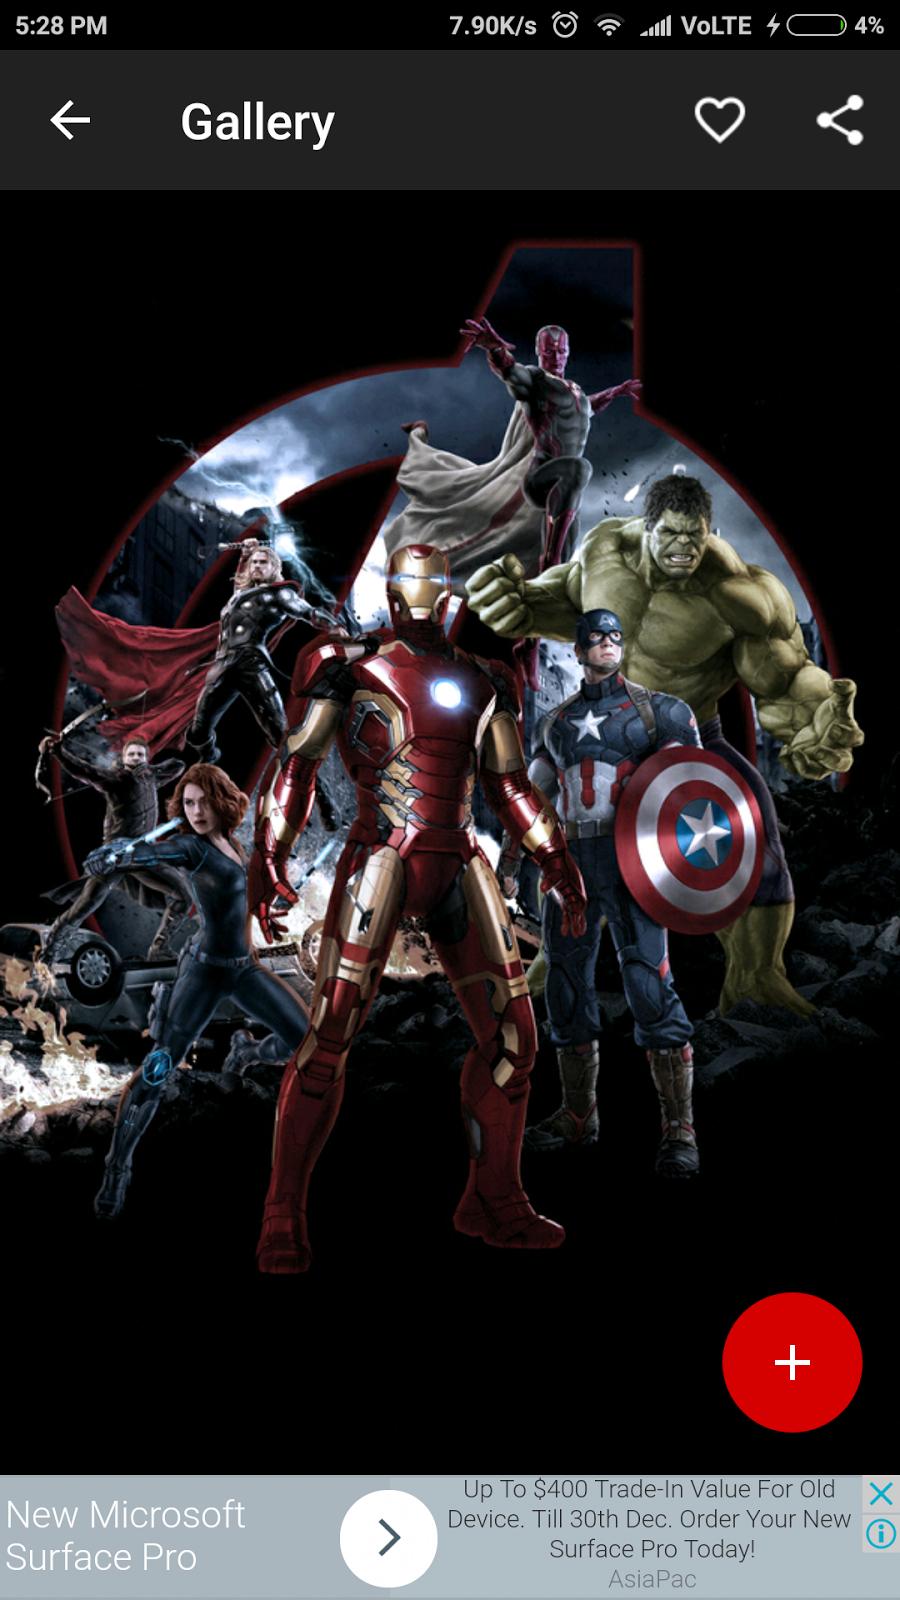 Best wallpaper app 2018-2019 | new marvel superheroes ...